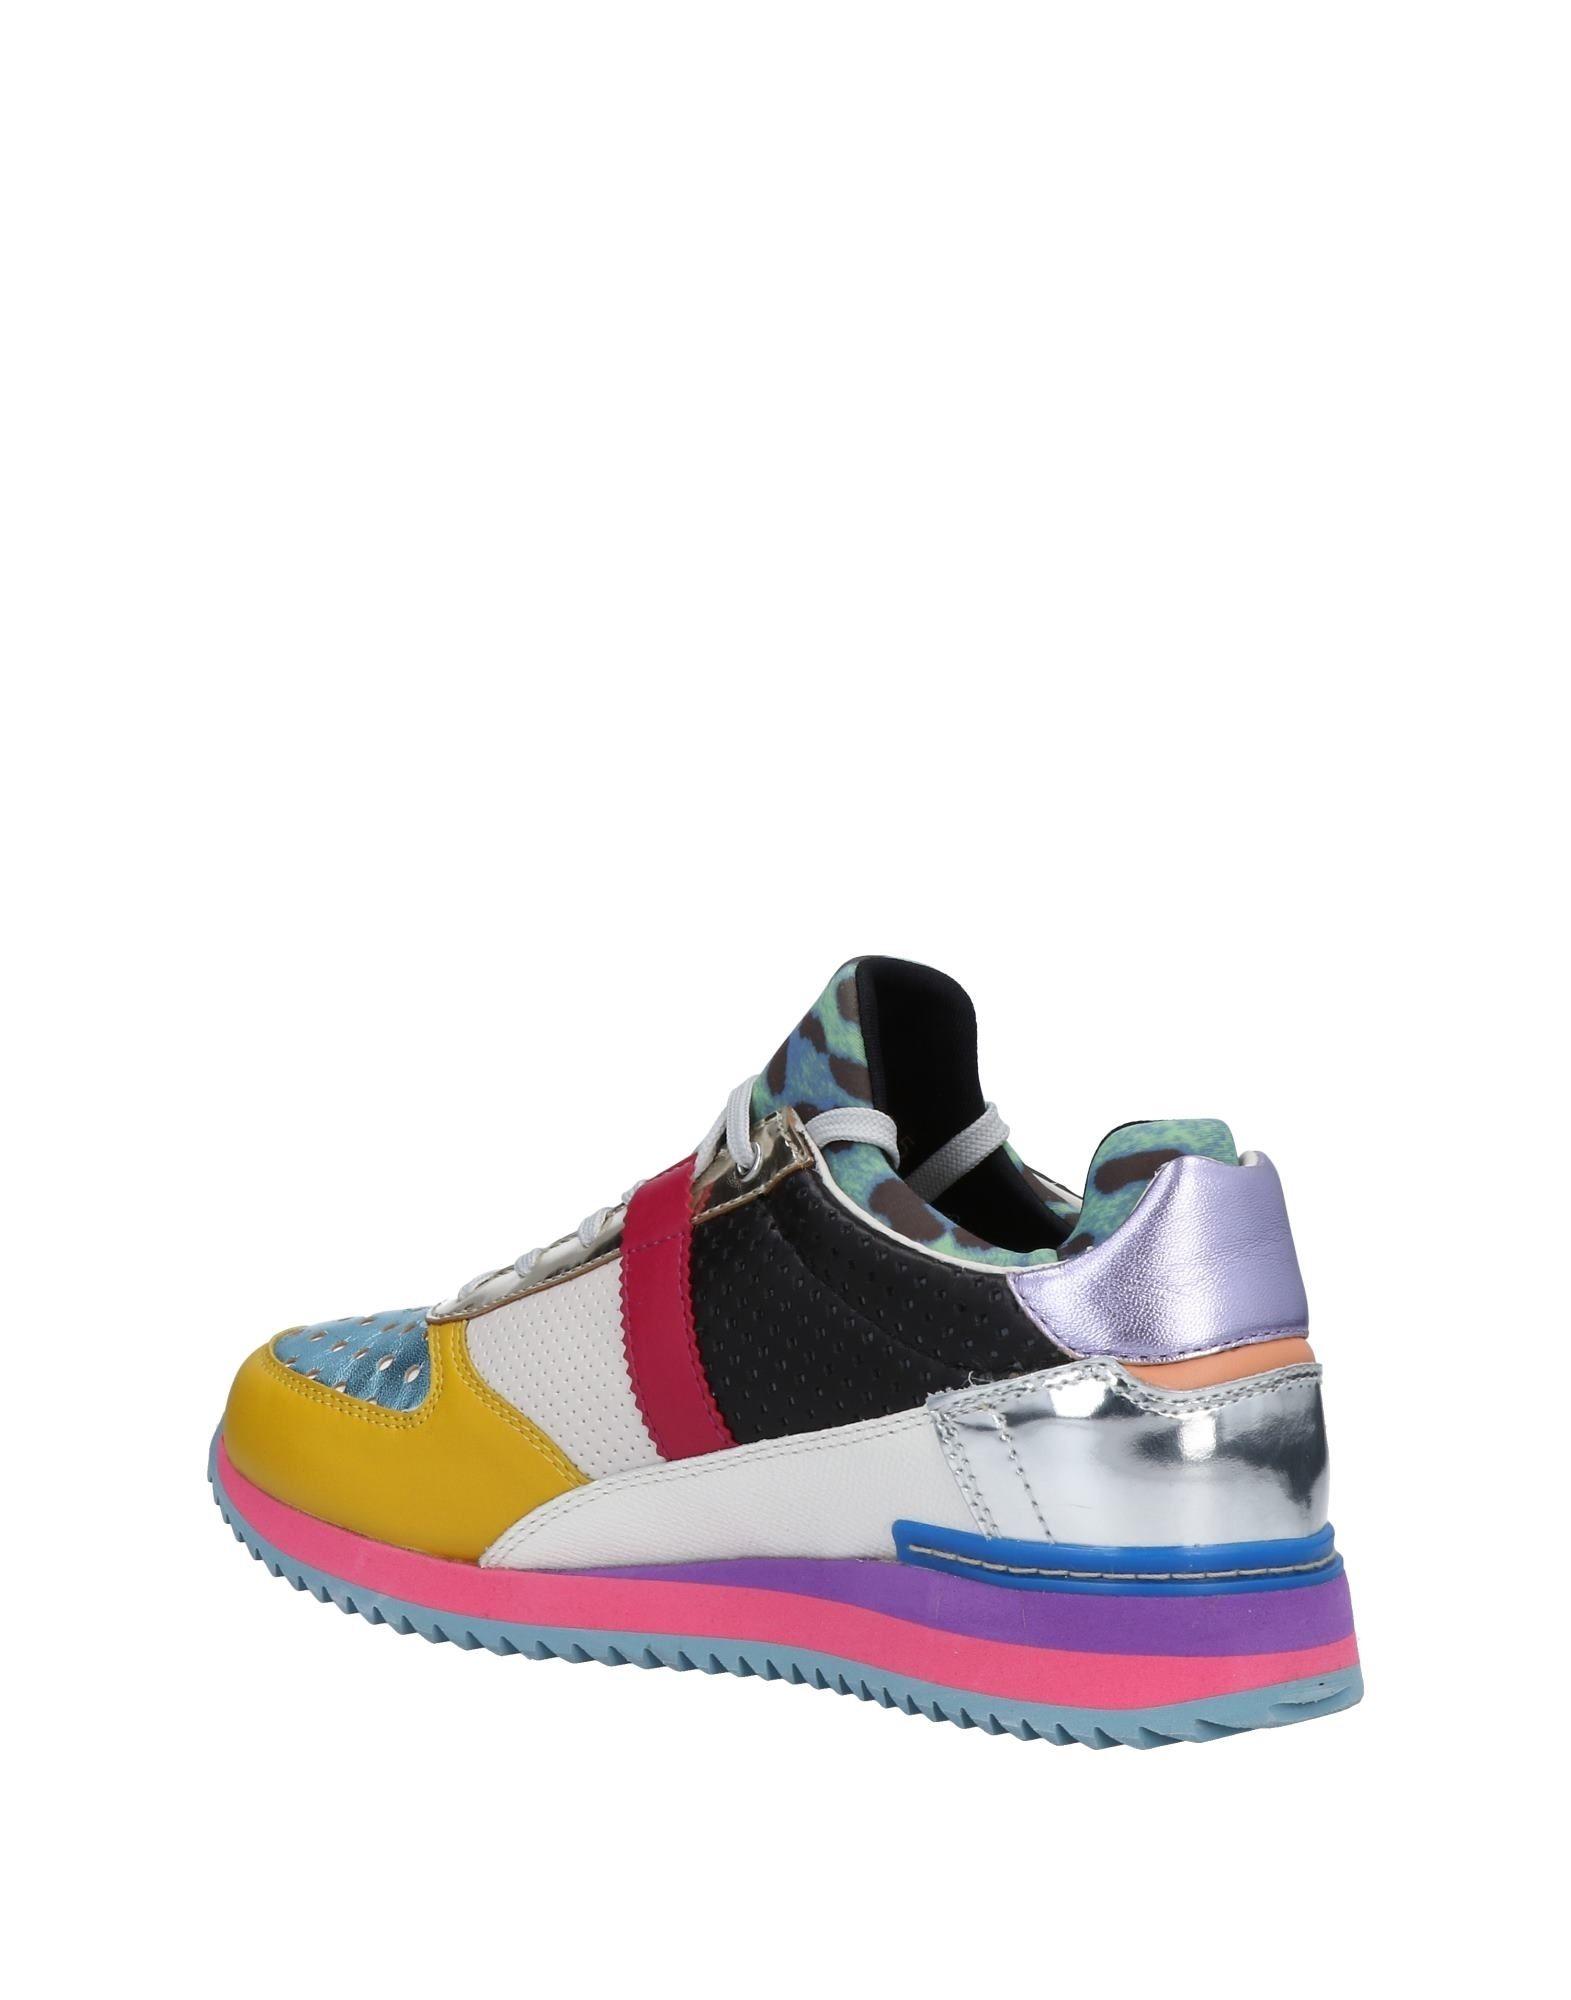 Dolce & Gabbana Sneakers Damen Schuhe  11474922UQGünstige gut aussehende Schuhe Damen c3ece5